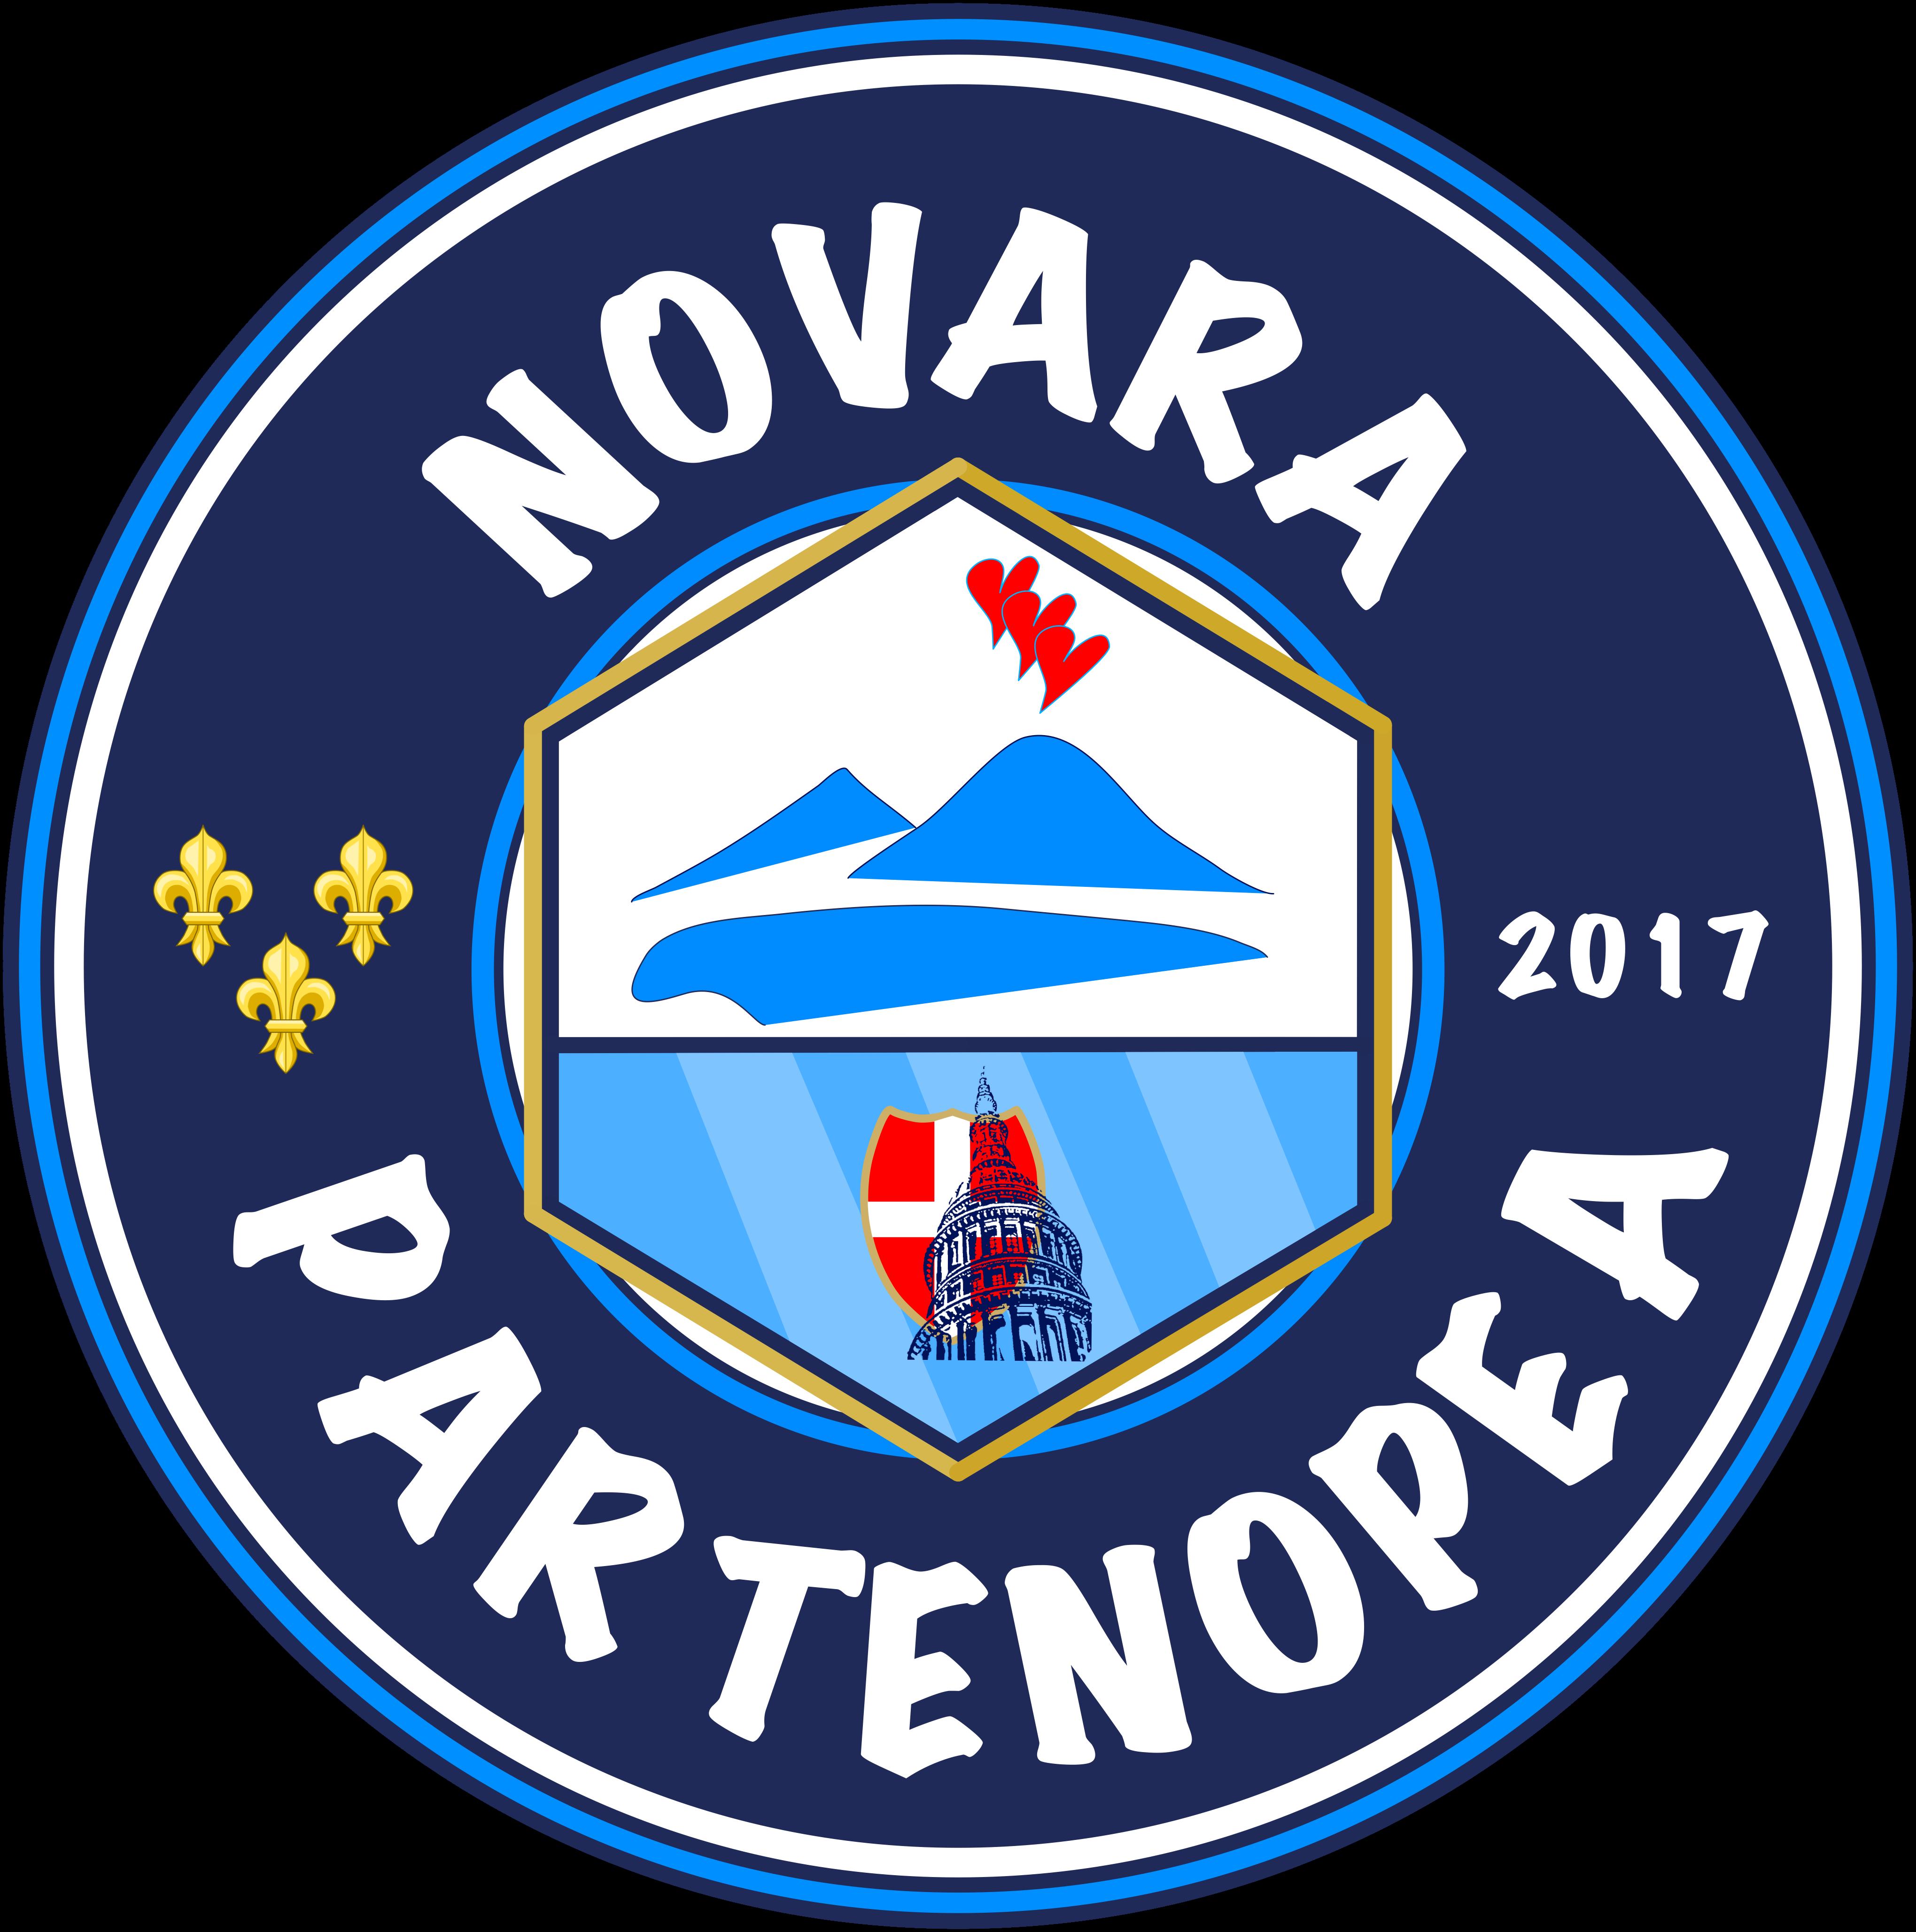 Associazione Culturale Club Napoli Novara Partenopea